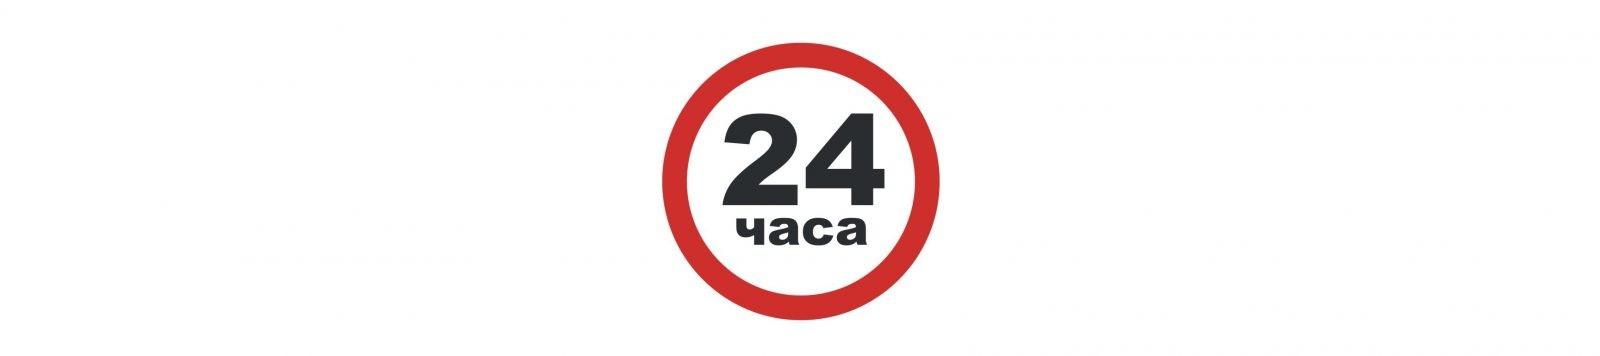 Грузчики 24 часа